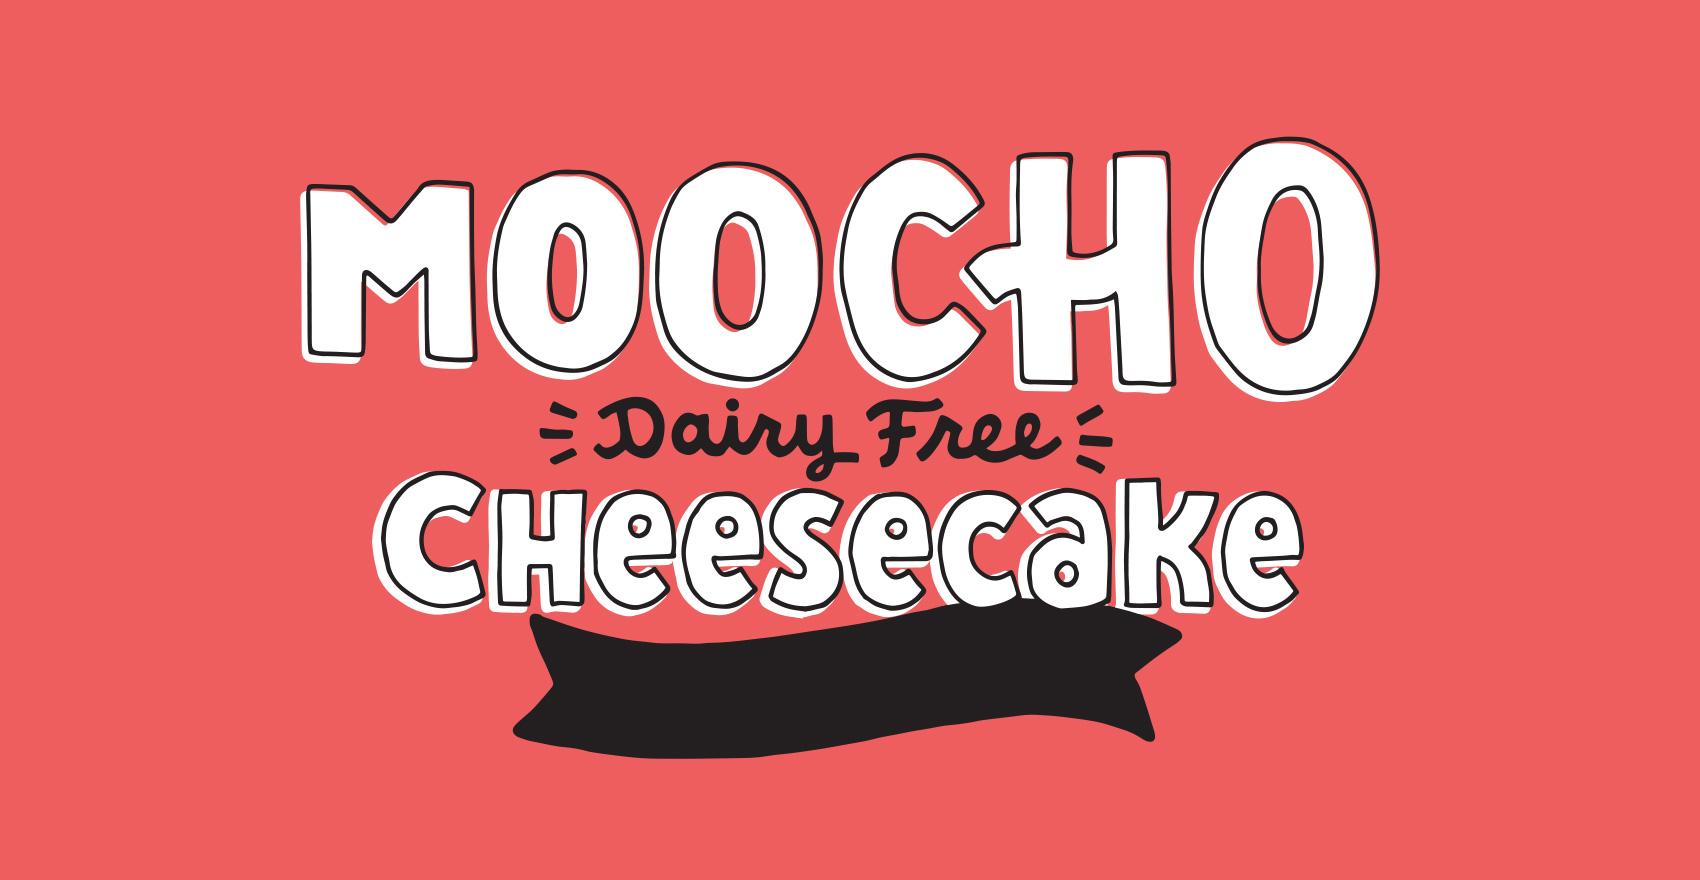 Hand lettered / hand drawn word mark for Tofurky brand MOOCHO vegan / dairy free cheesecake.